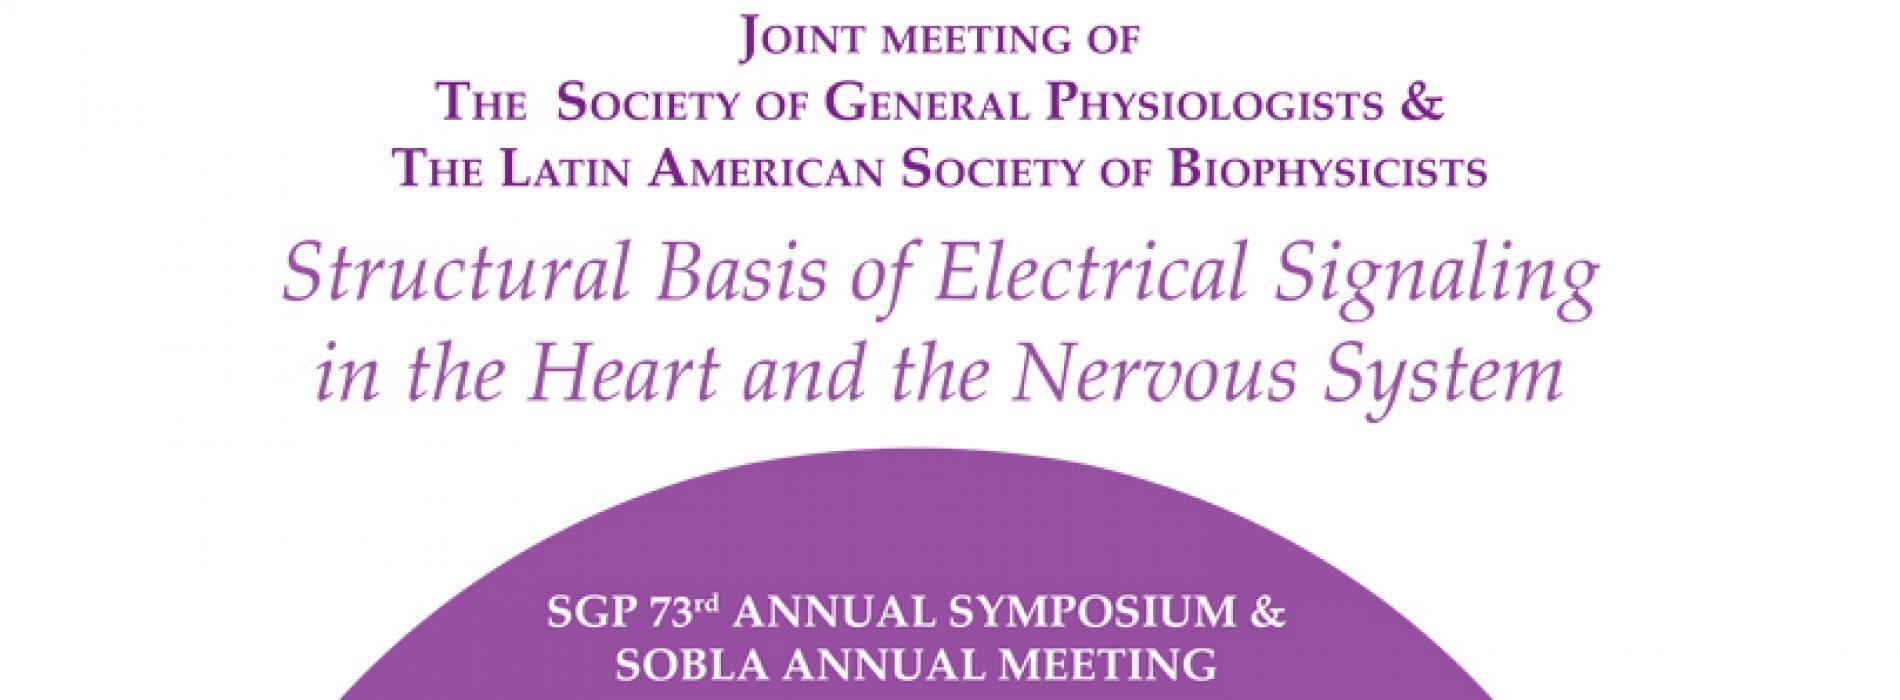 SGP 73rd Annual Symposium & Sobla Annual Meeting